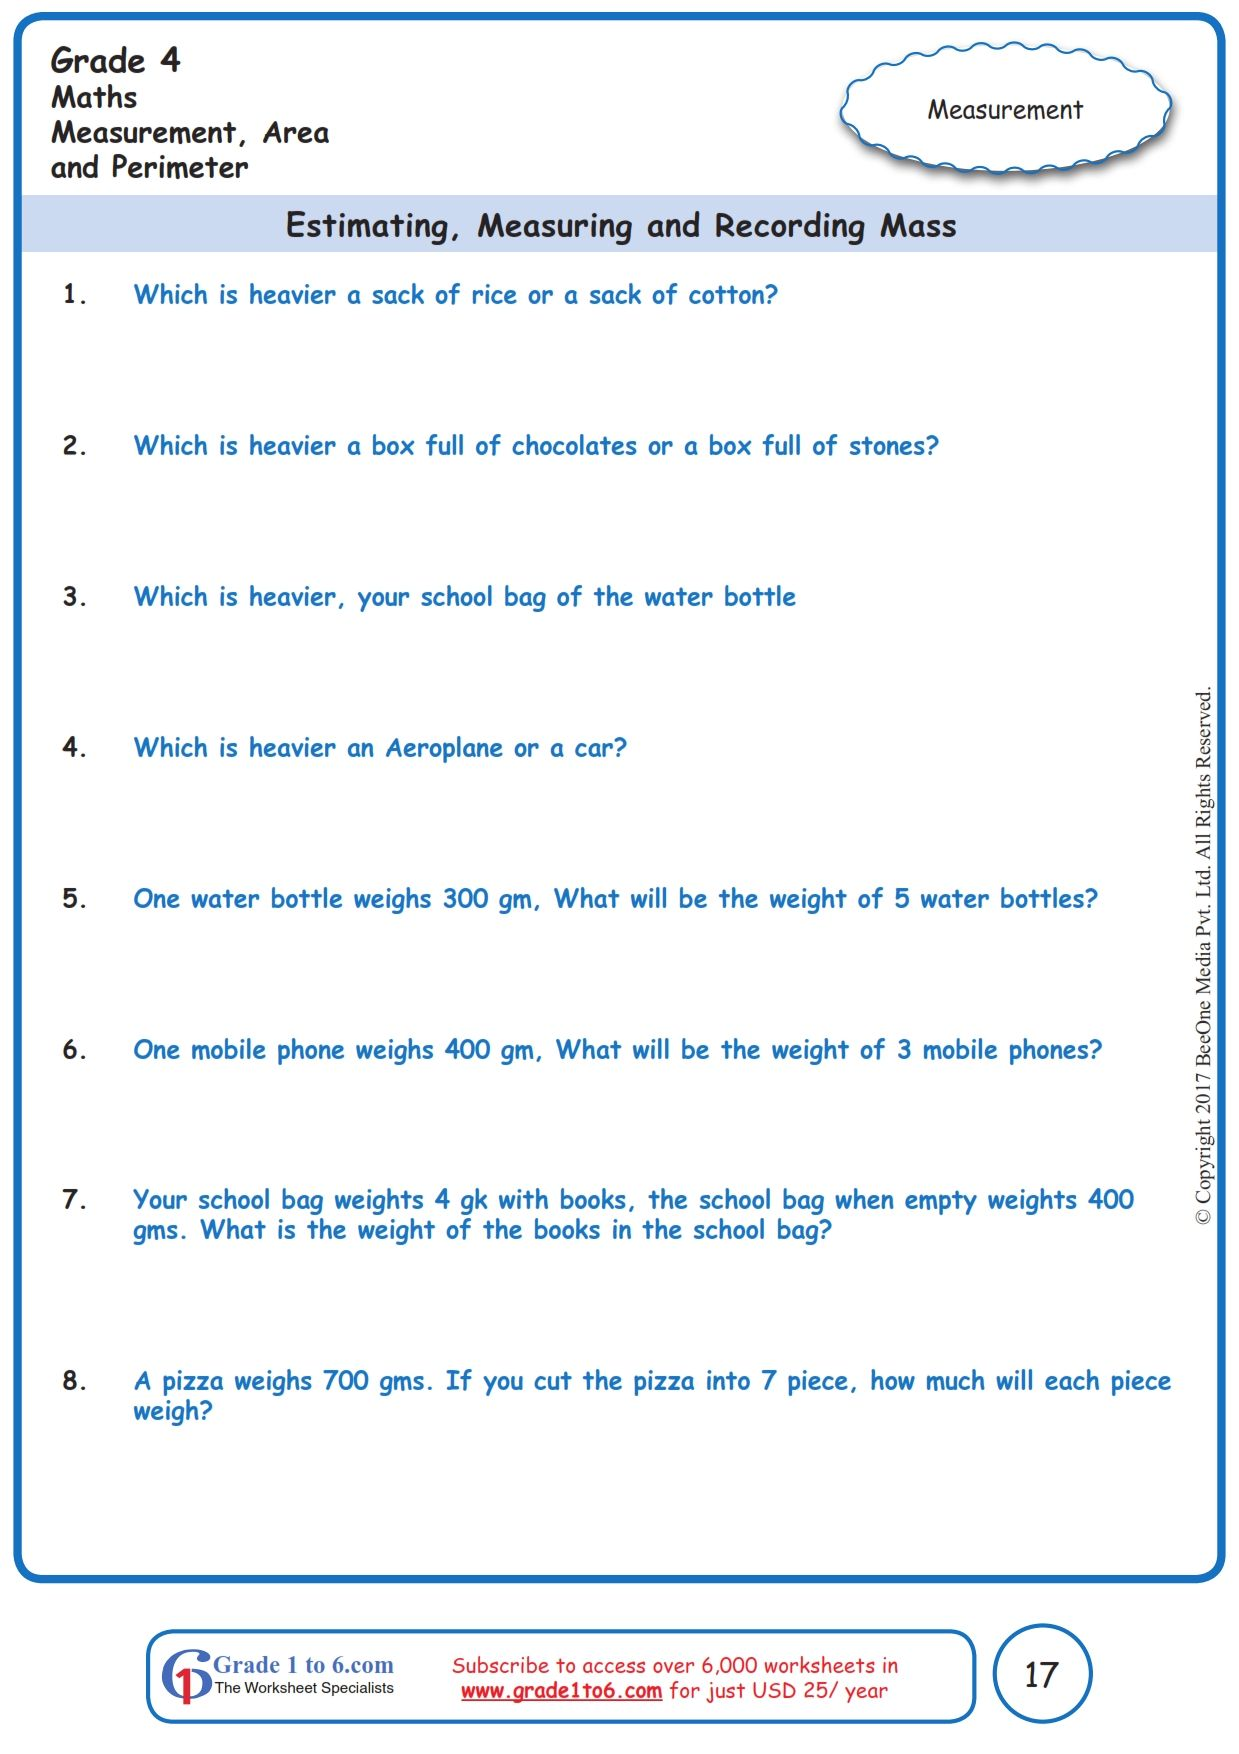 Worksheet Grade 4 Math Estimating Measuring And